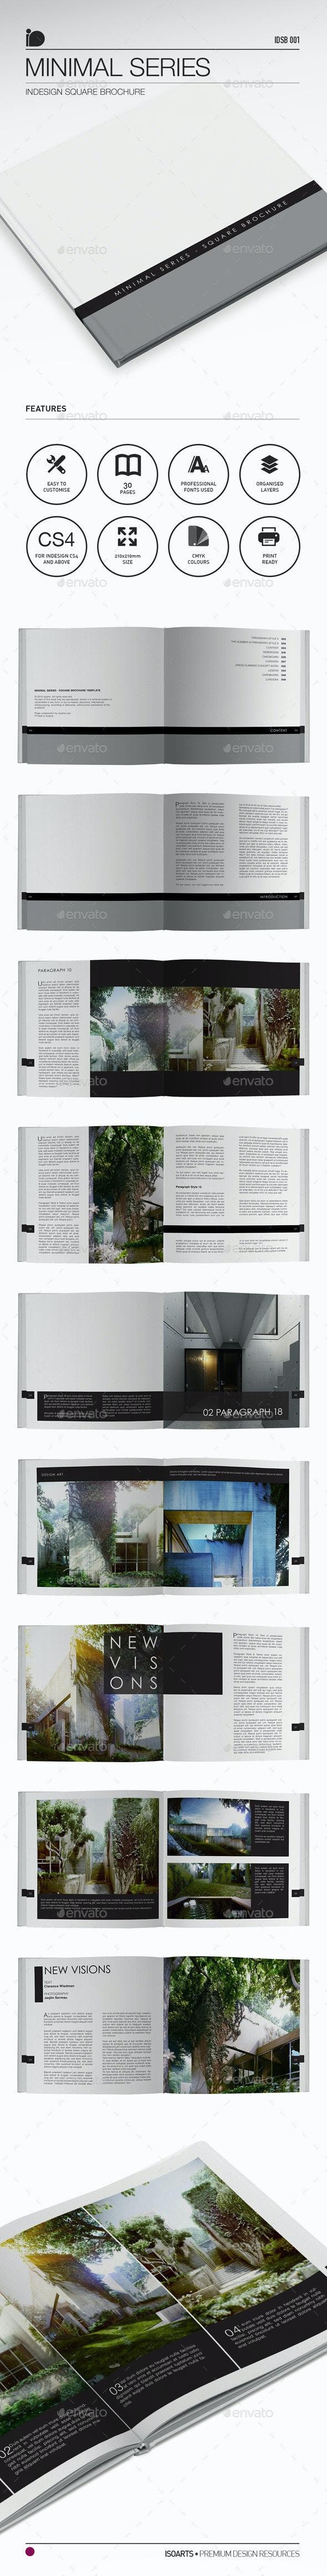 Square Brochure • Minimal Series - Print Templates